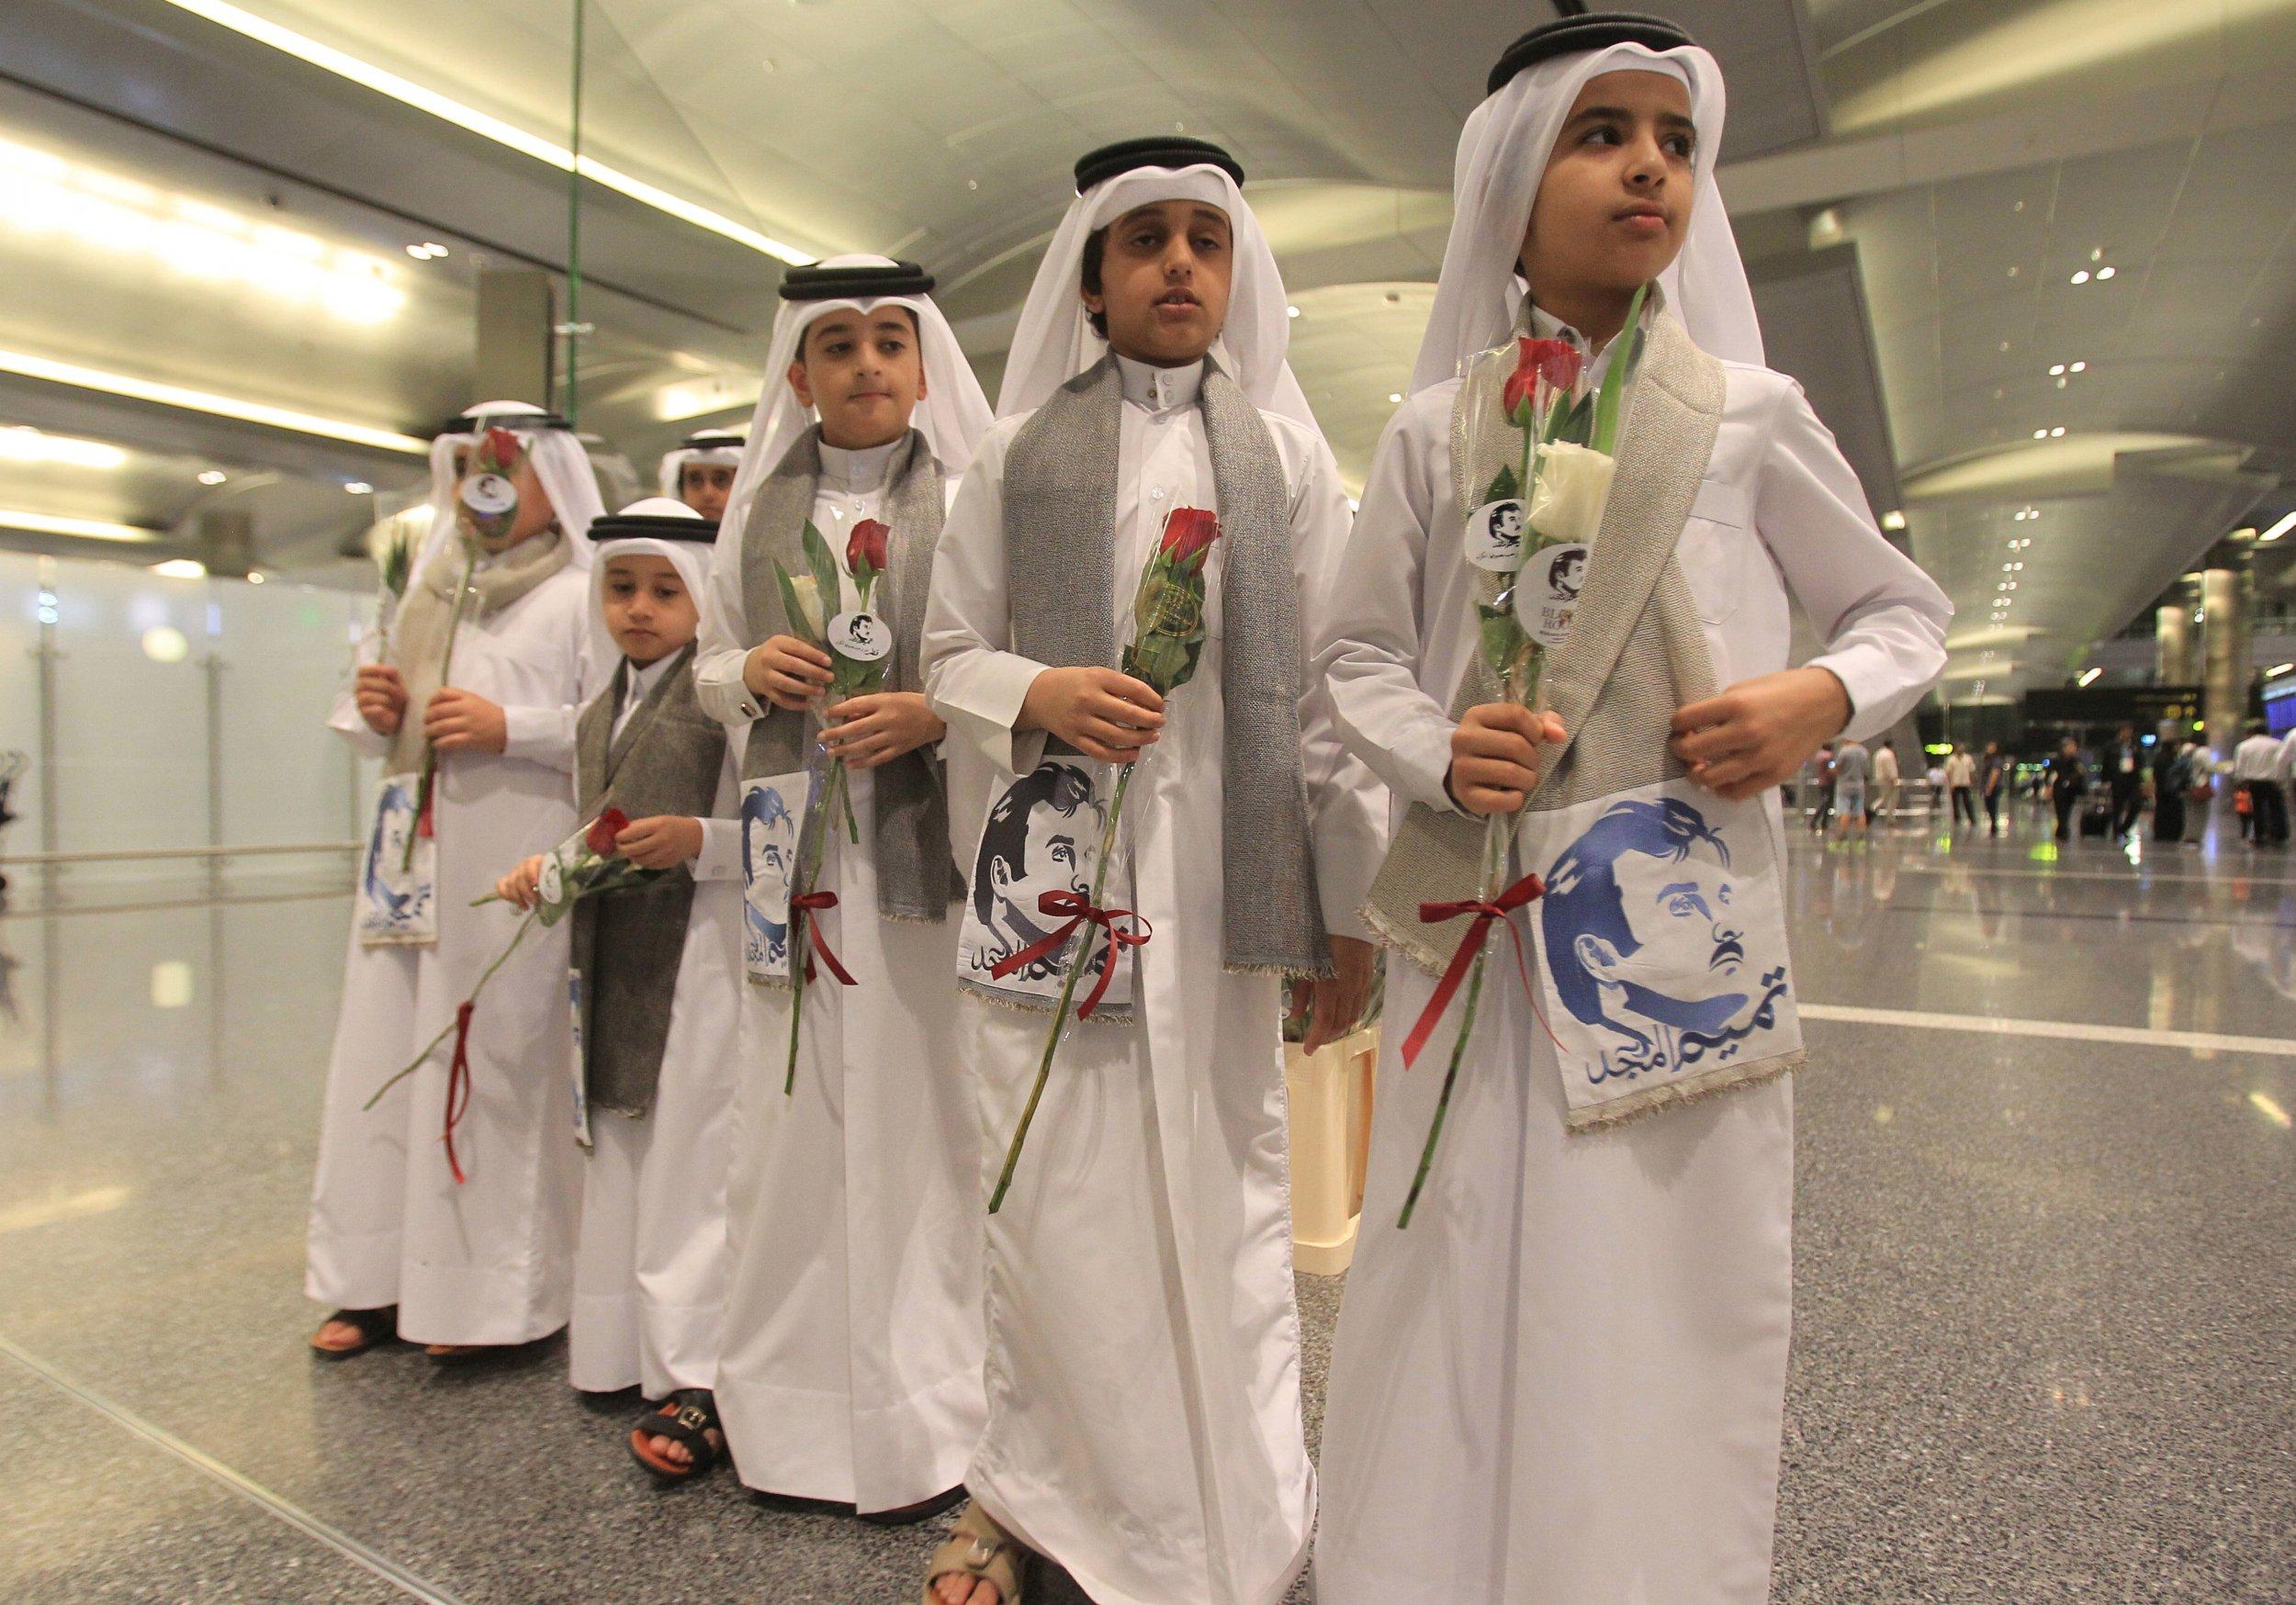 Qatari children hold flowers and pictures of Qatar Emir Sheikh Tamim Bin Hamad Al-Thani